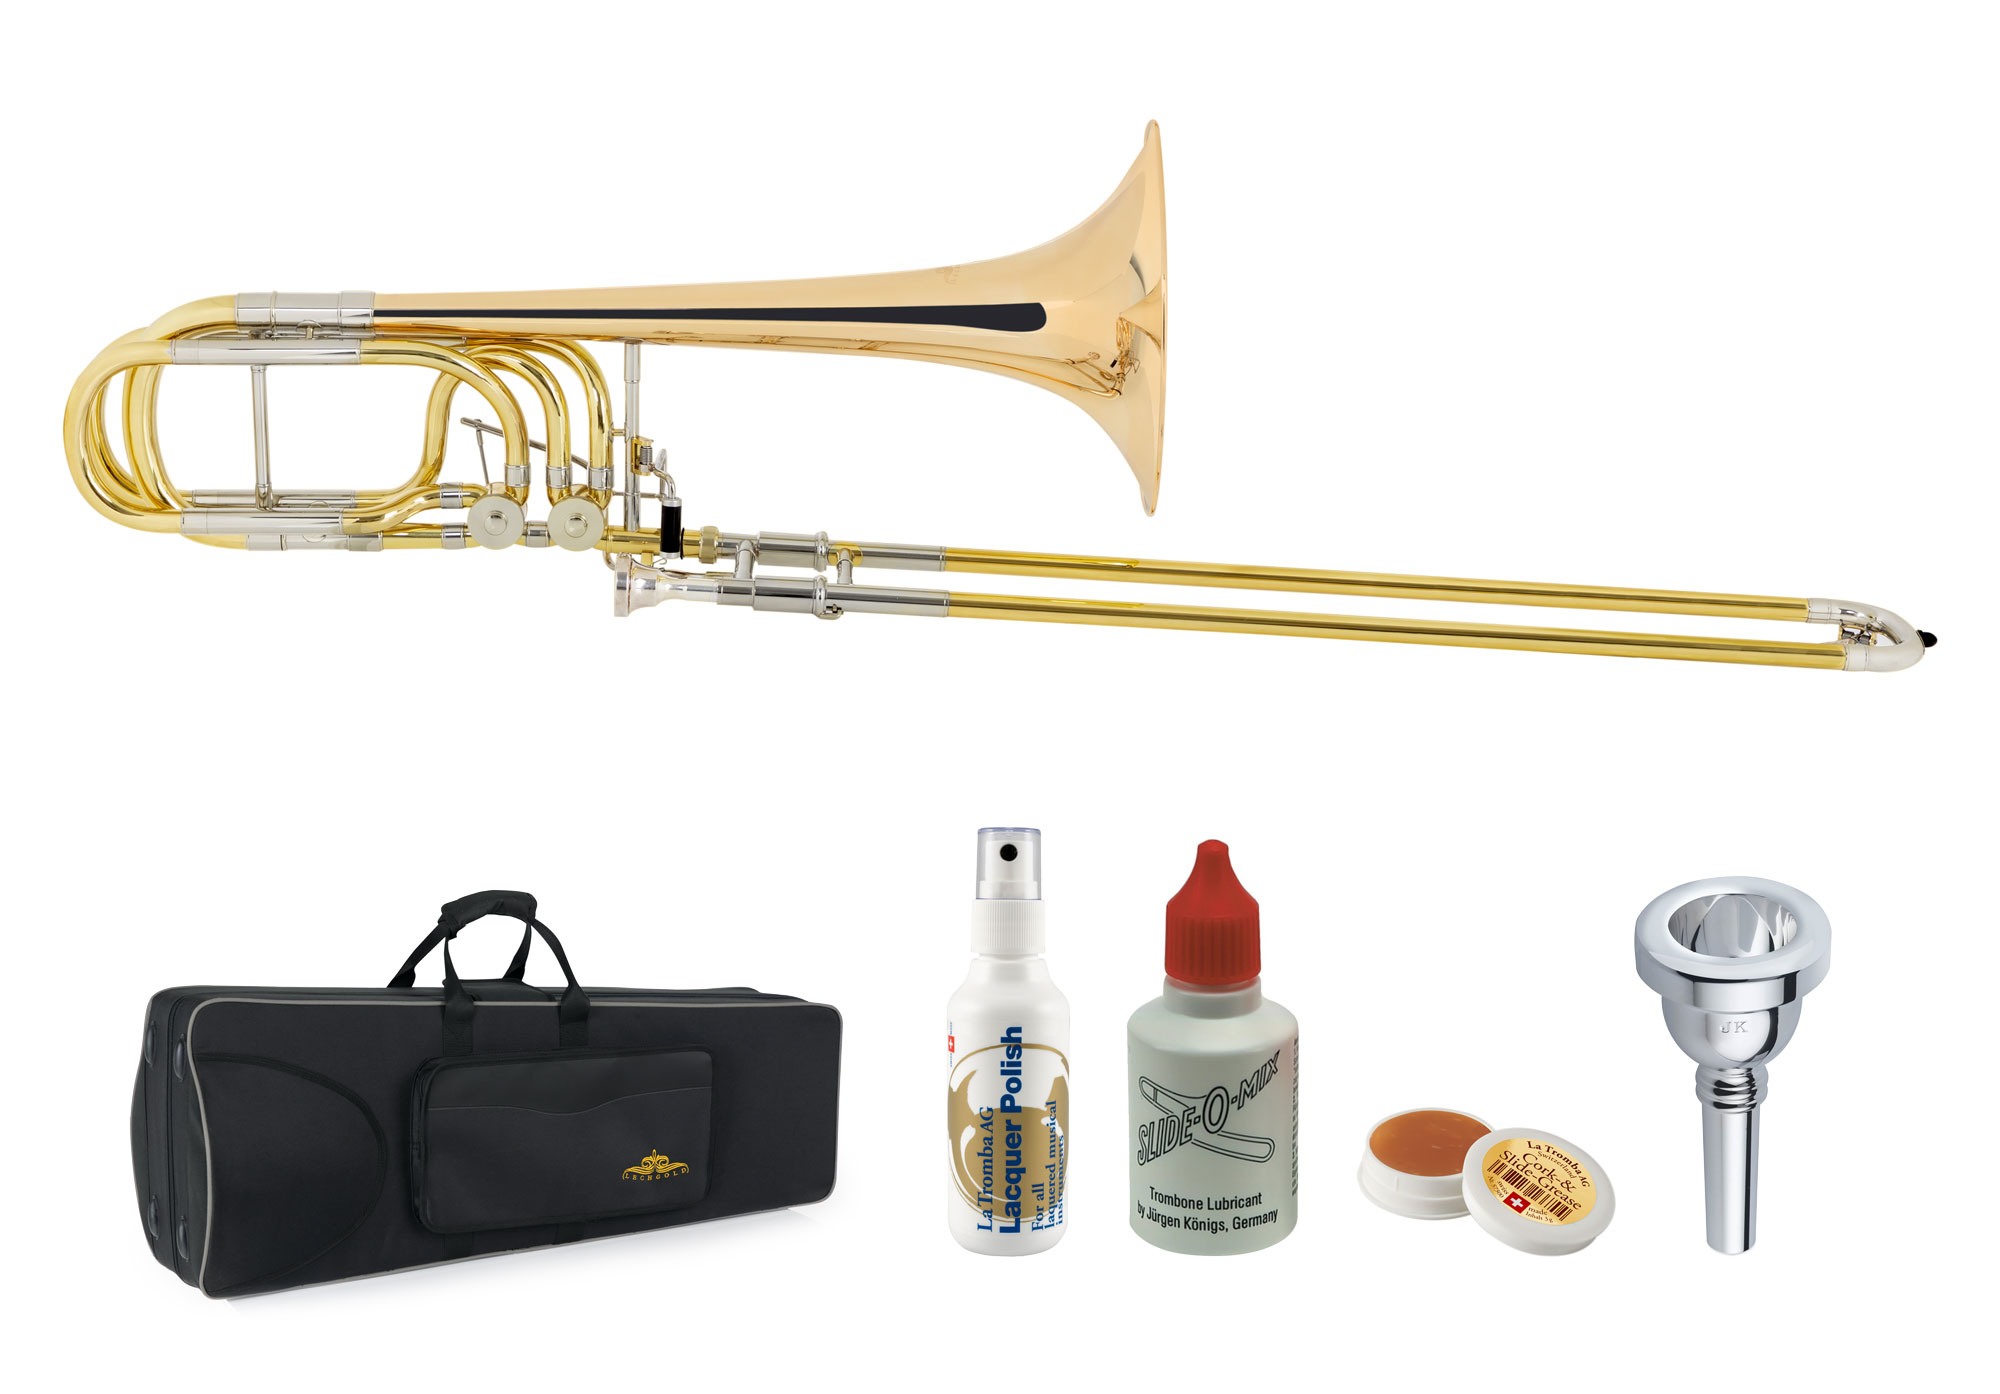 Posaunen - Lechgold BP 18 GMs Bassposaune Goldmessing Deluxe Set - Onlineshop Musikhaus Kirstein